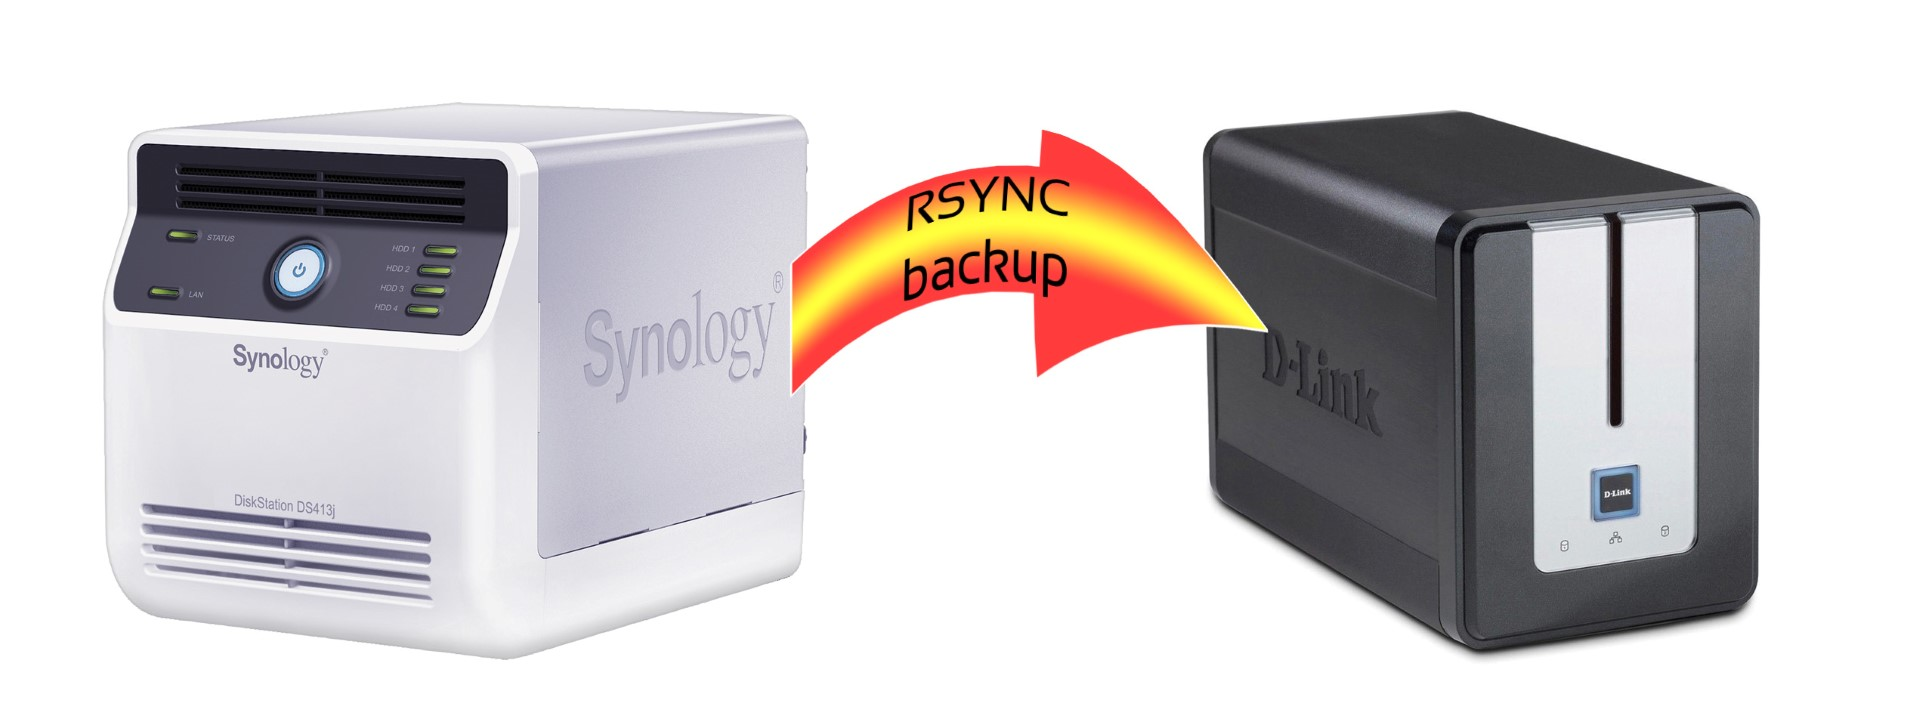 Rsync backups